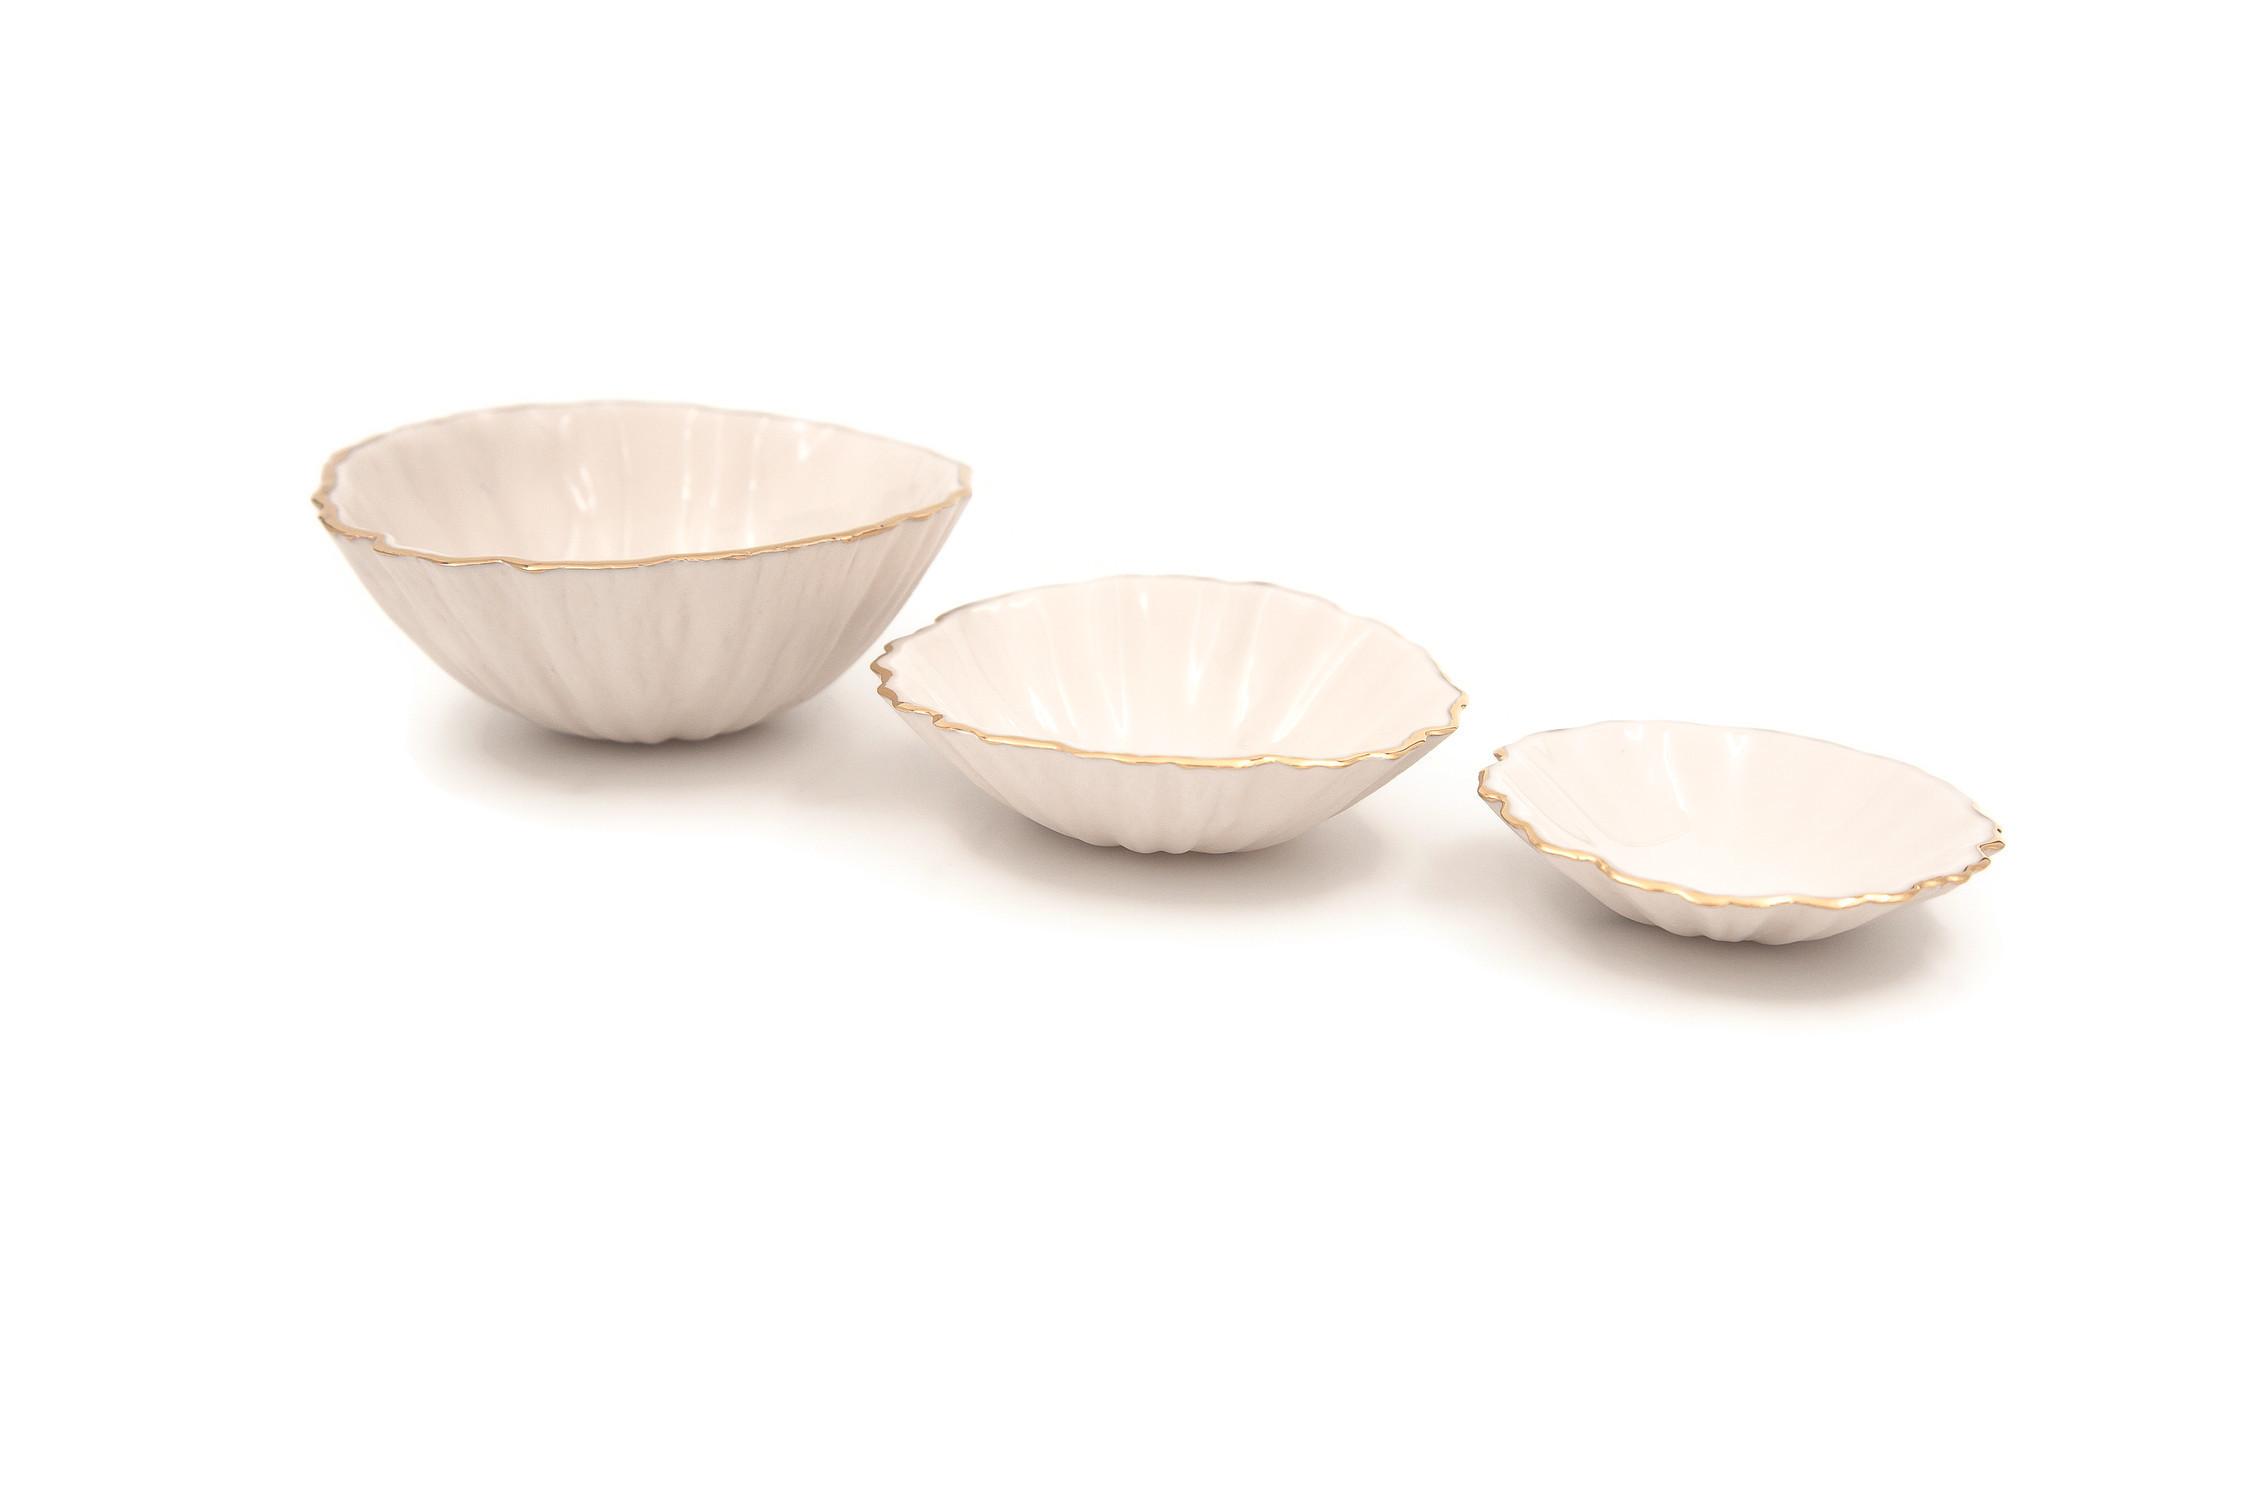 Handmade Porcelain Nesting Bowls (Set of 3)...